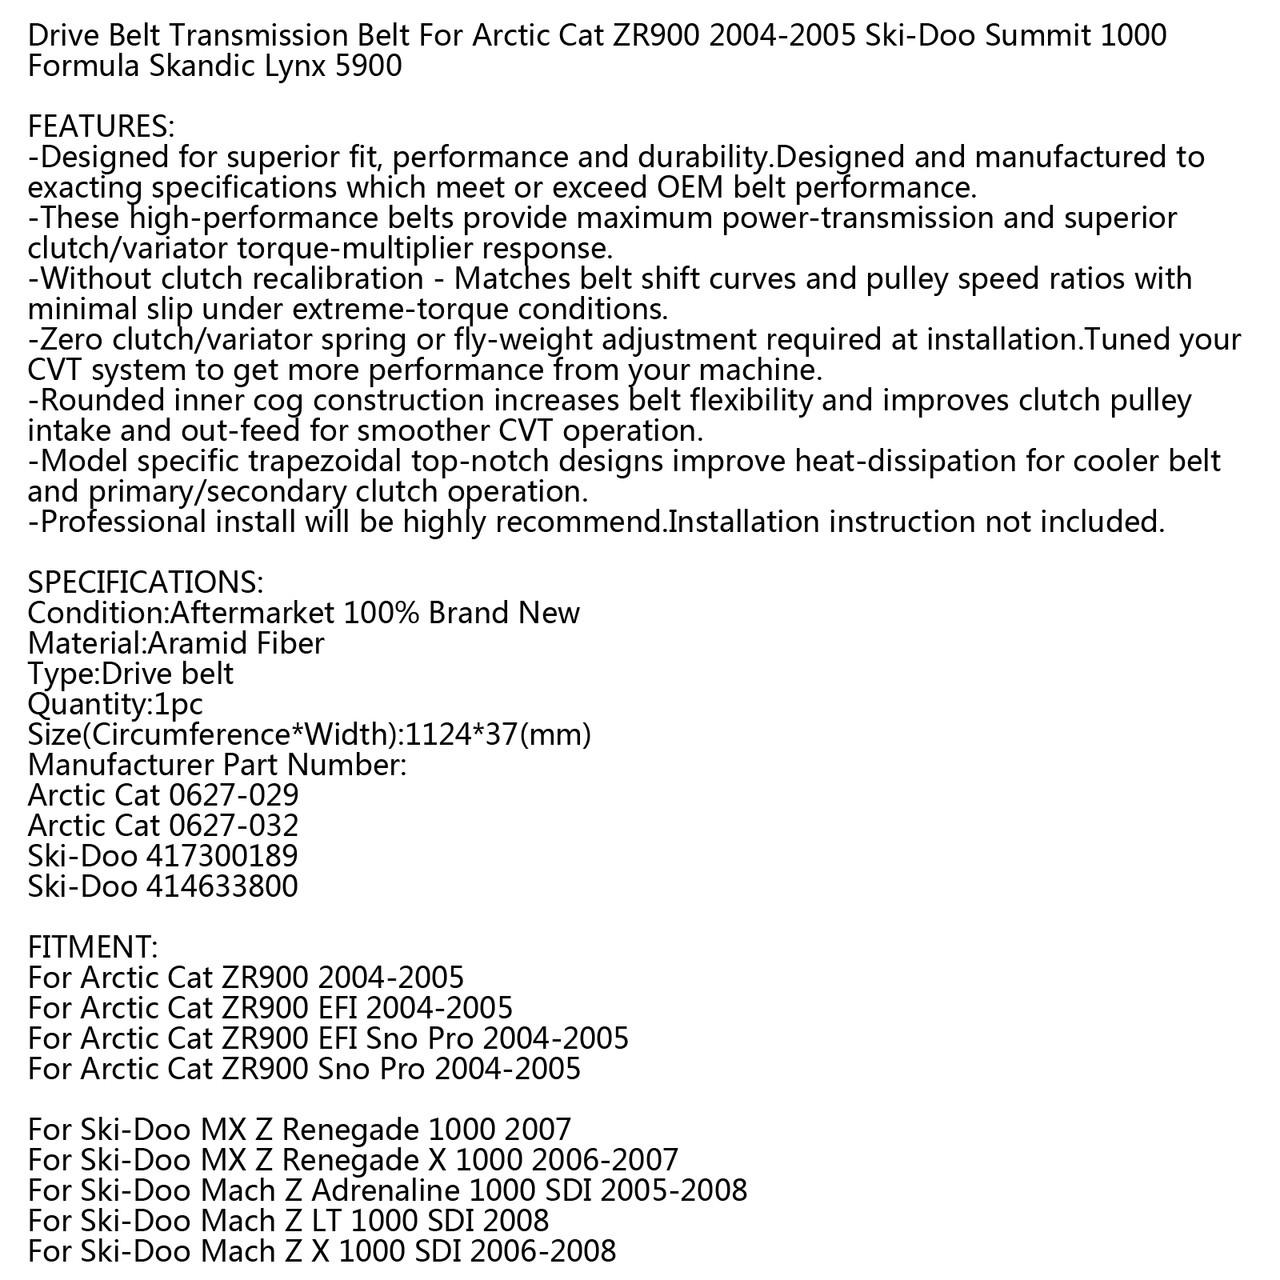 Drive Belt For Arctic Cat ZR900 EFI Sno Pro 04-15 Ski-Doo MX Z Renegade 1000 2007 ki-Doo Formula MX 1991-1993 Lynx 5900 1999-2006 Black